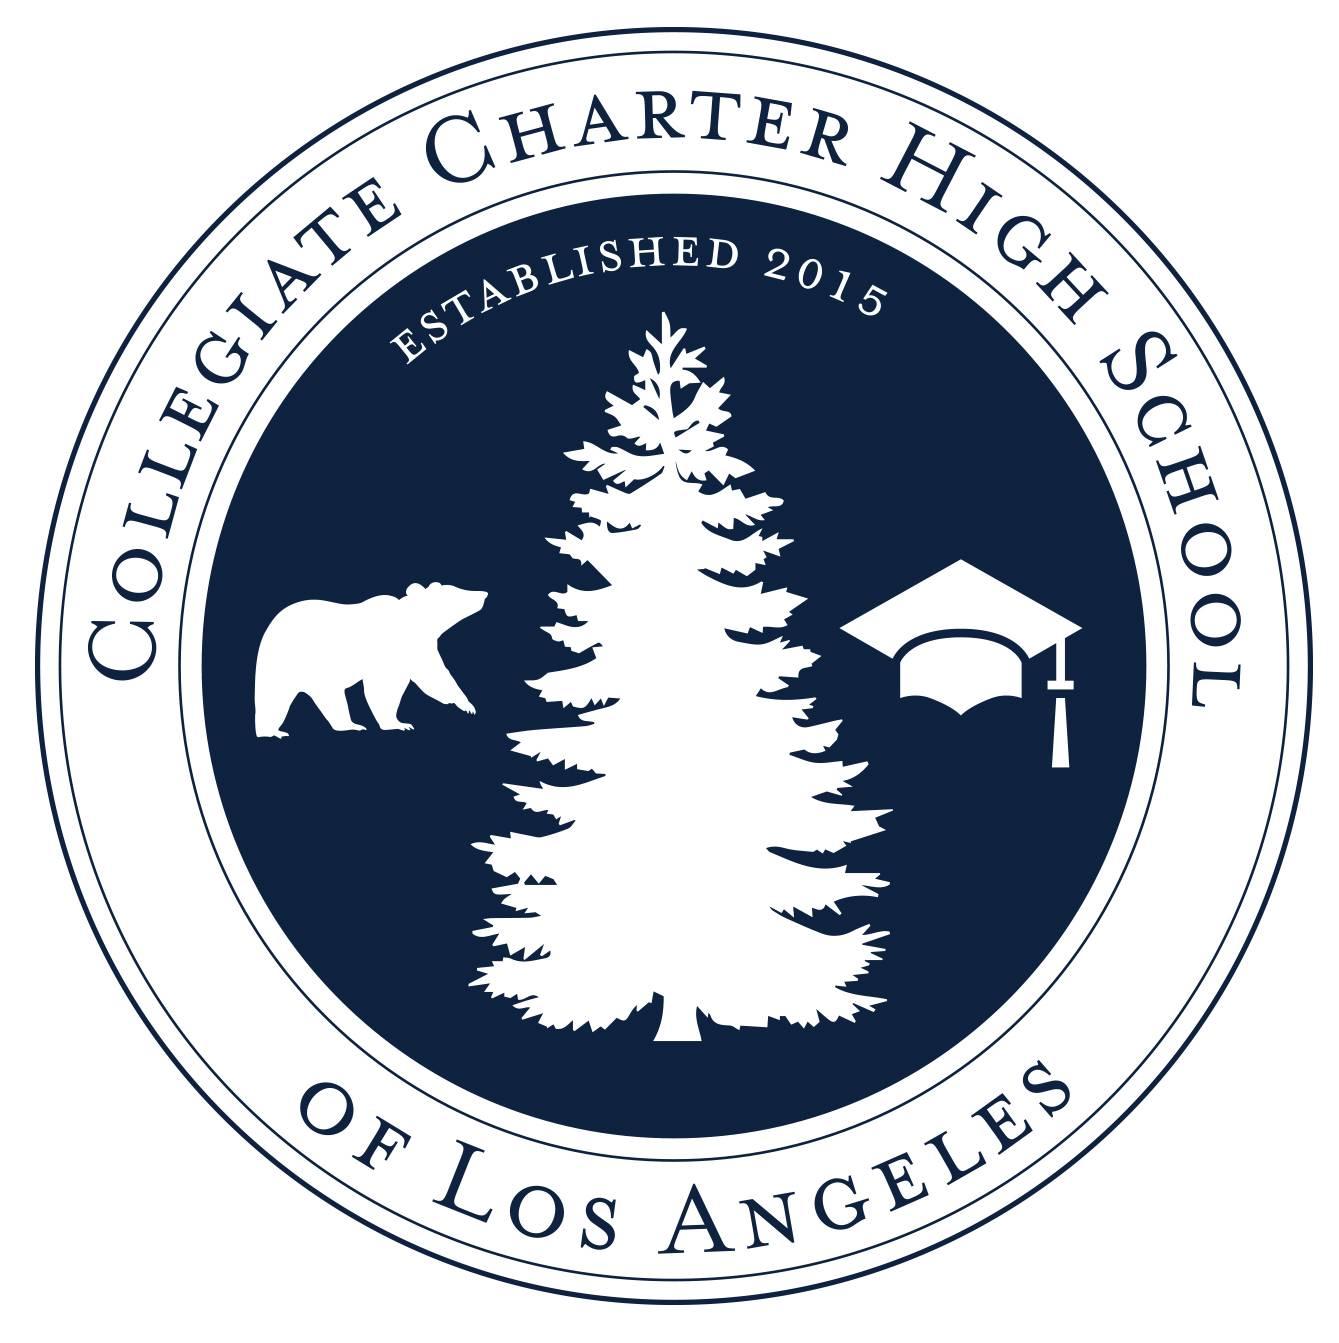 Logo of Collegiate Charter High School of Los Angeles